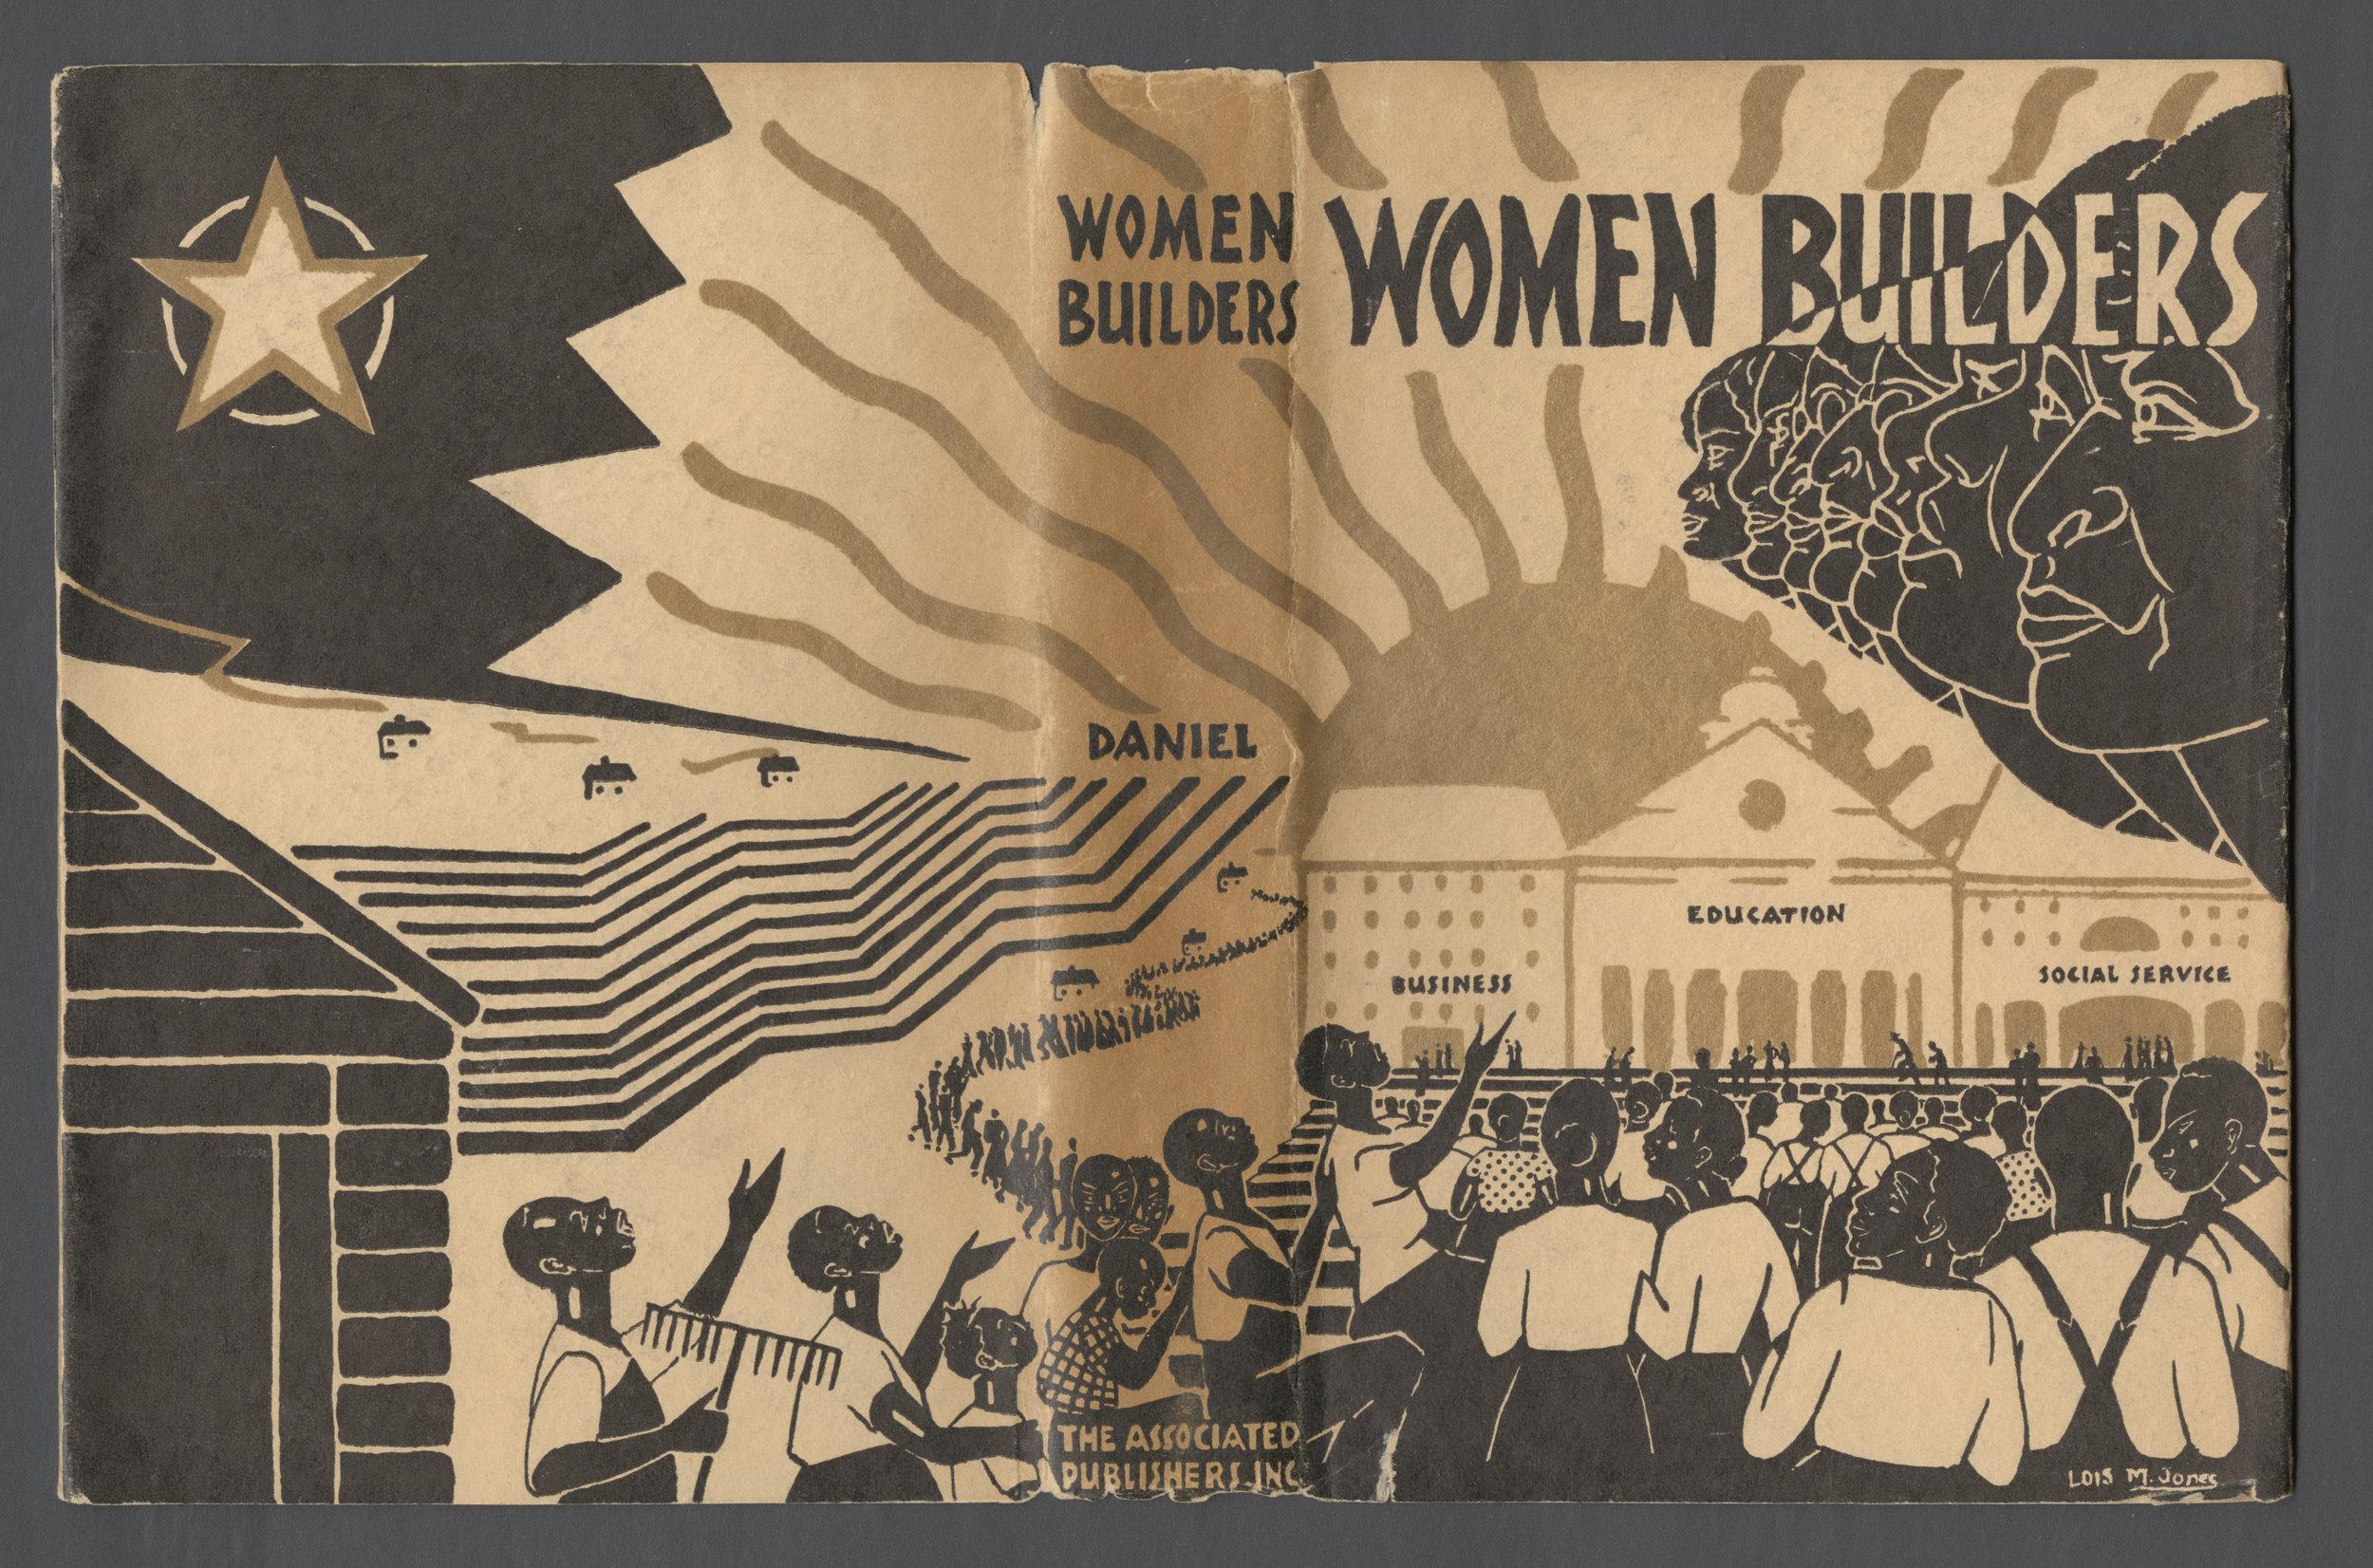 Women Builders, 1931, Published by the Associated Publishers. Sadie Iola Daniel (American, b. 1892 - 1975), Dust Jacket: Lois Mailou Jones (American, b. 1905 - 1998).